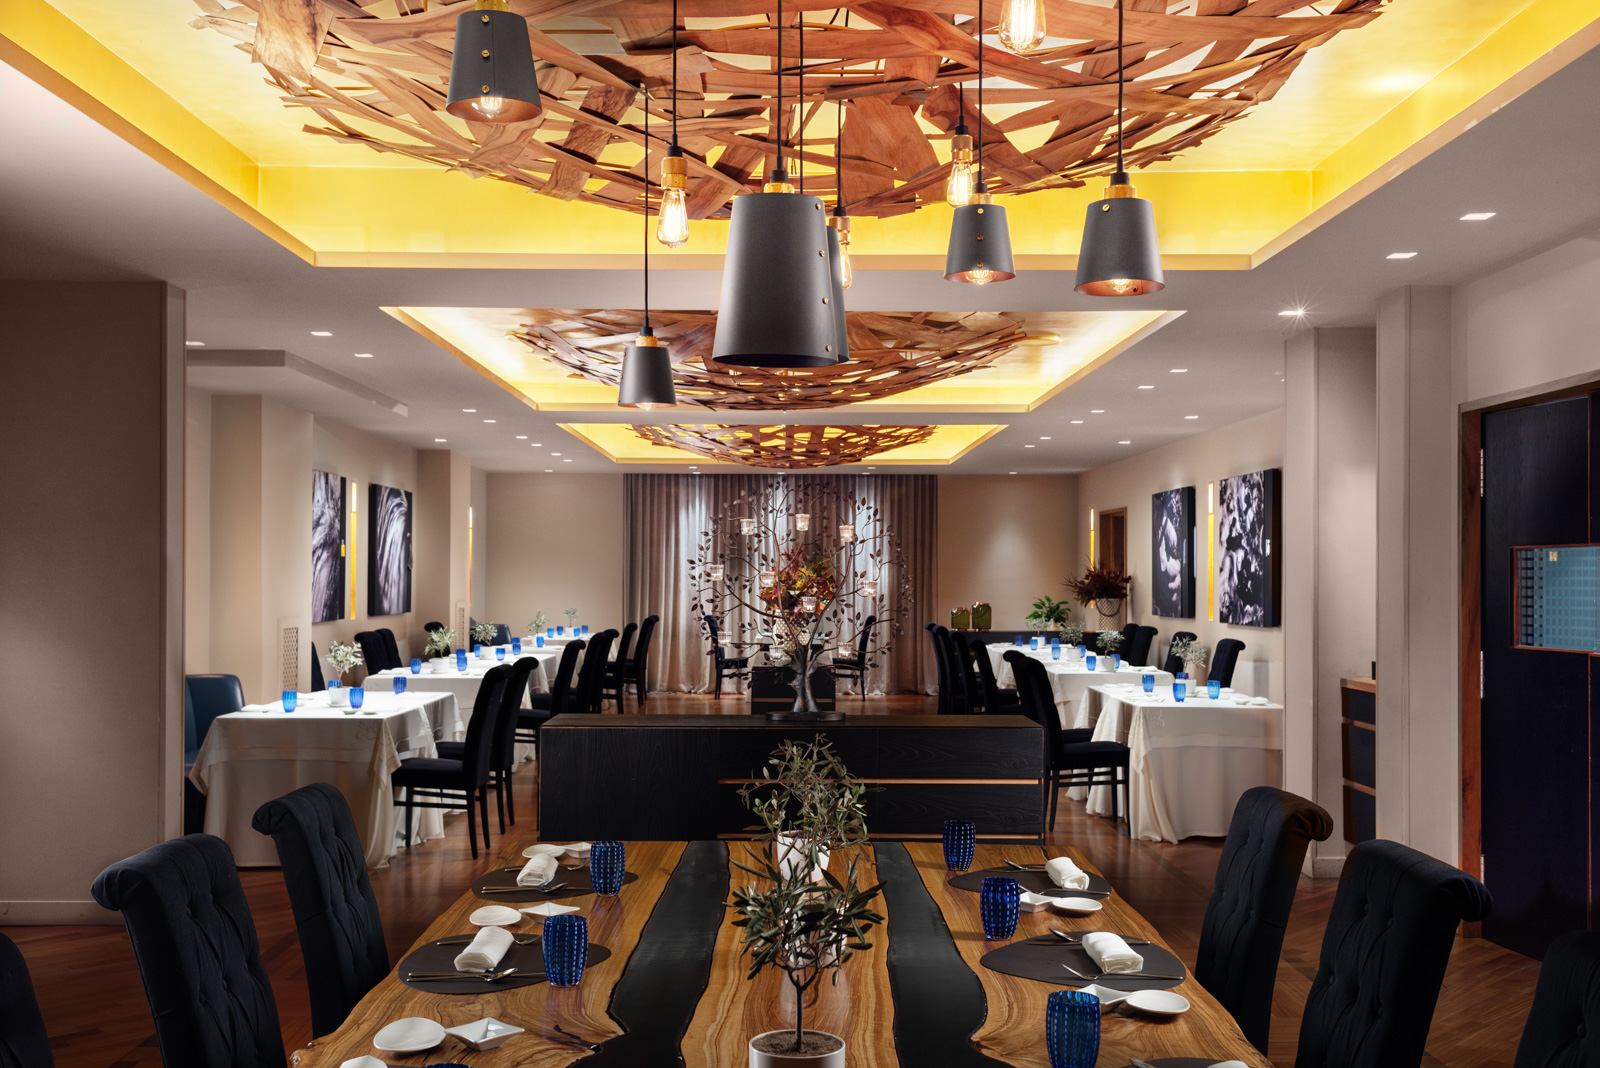 tre-olivi-savoy-beach-hotel-paestum-capaccio-fotografia-architettura-interni-salerno-camapnia